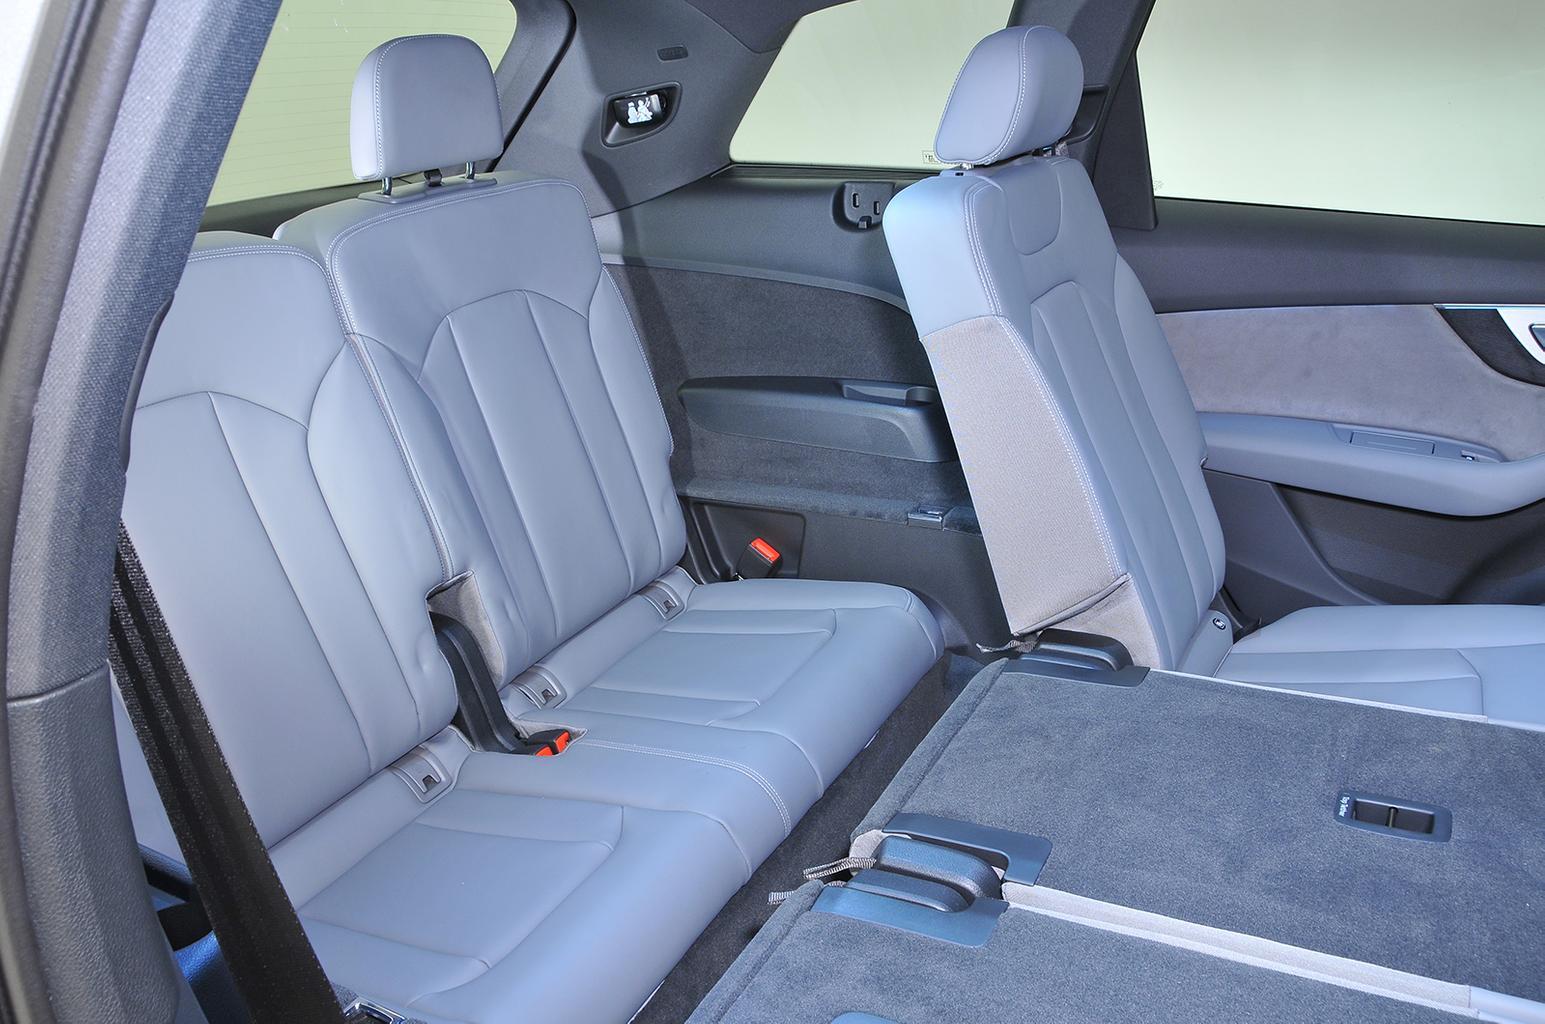 Used test: Audi Q7 vs Volvo XC90